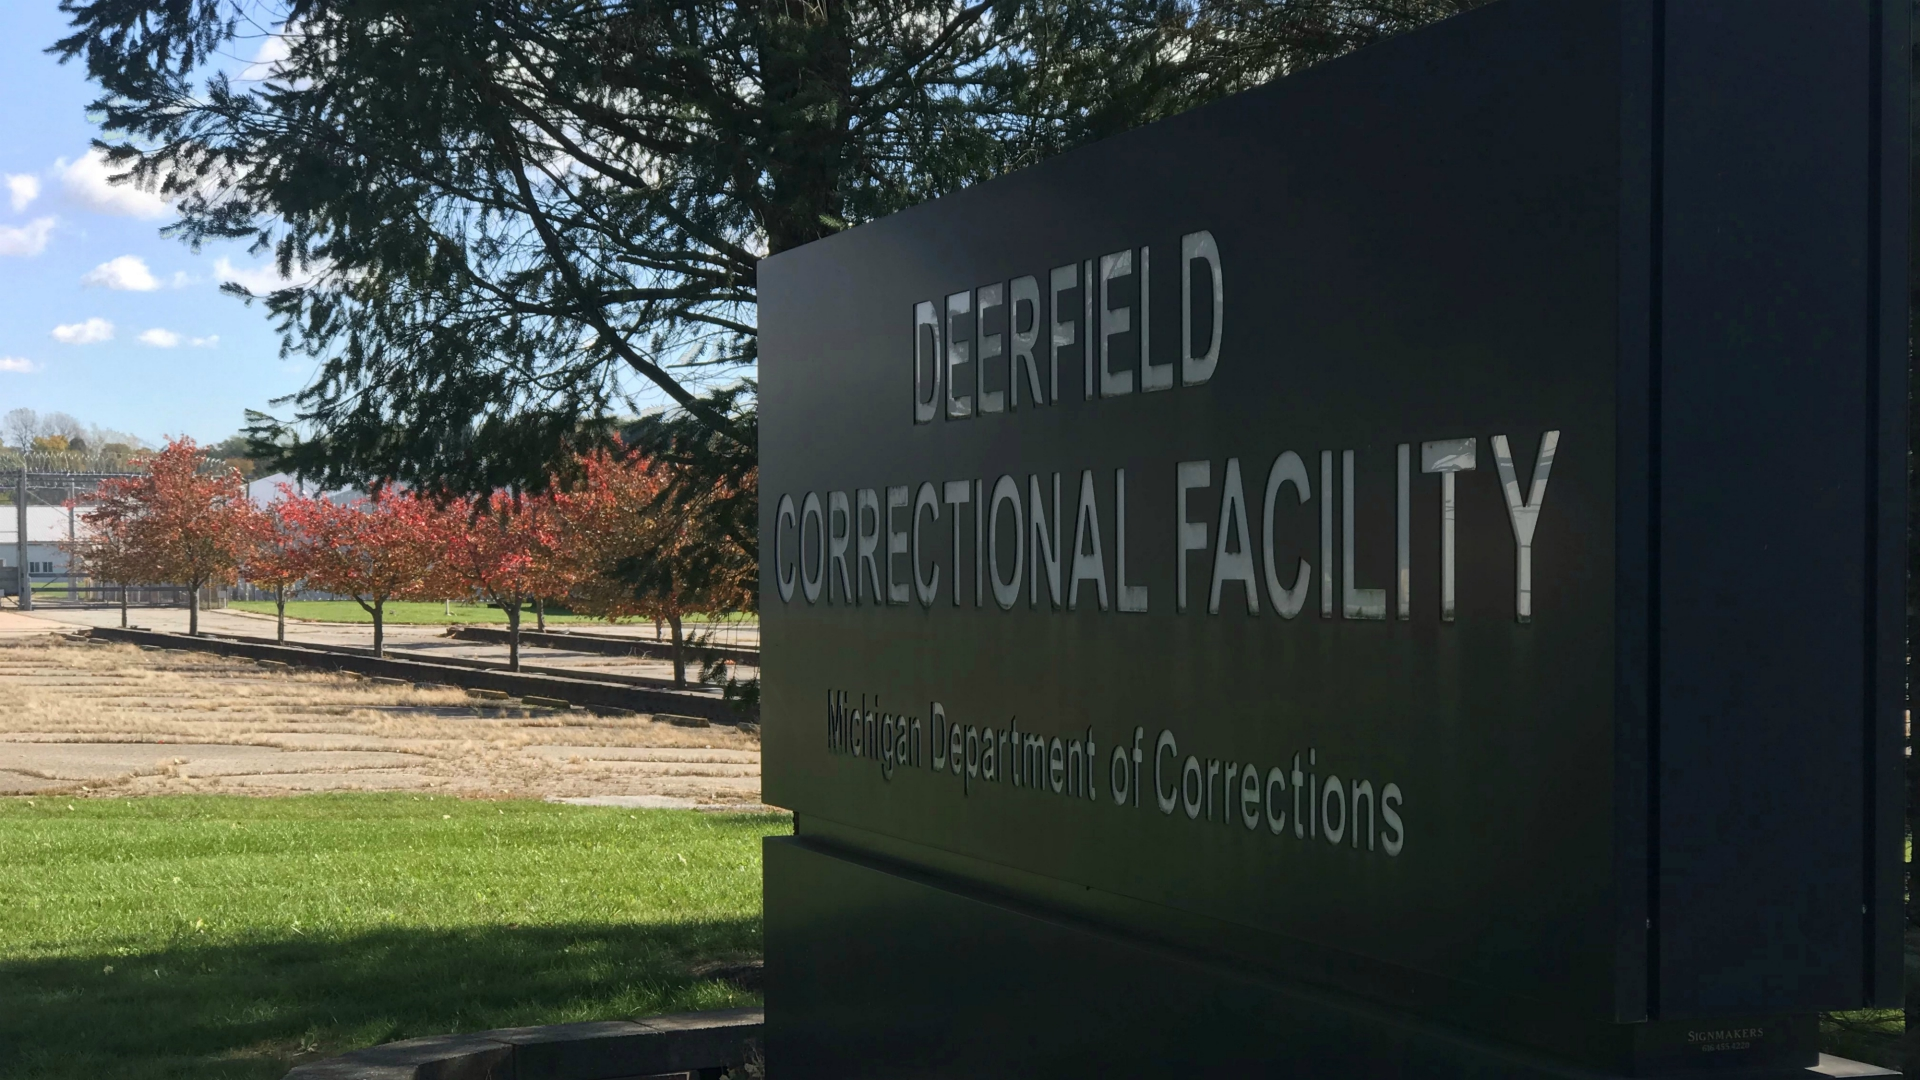 Ionia former Deerfield Correctional Facility 101618_1539723622635.jpg.jpg